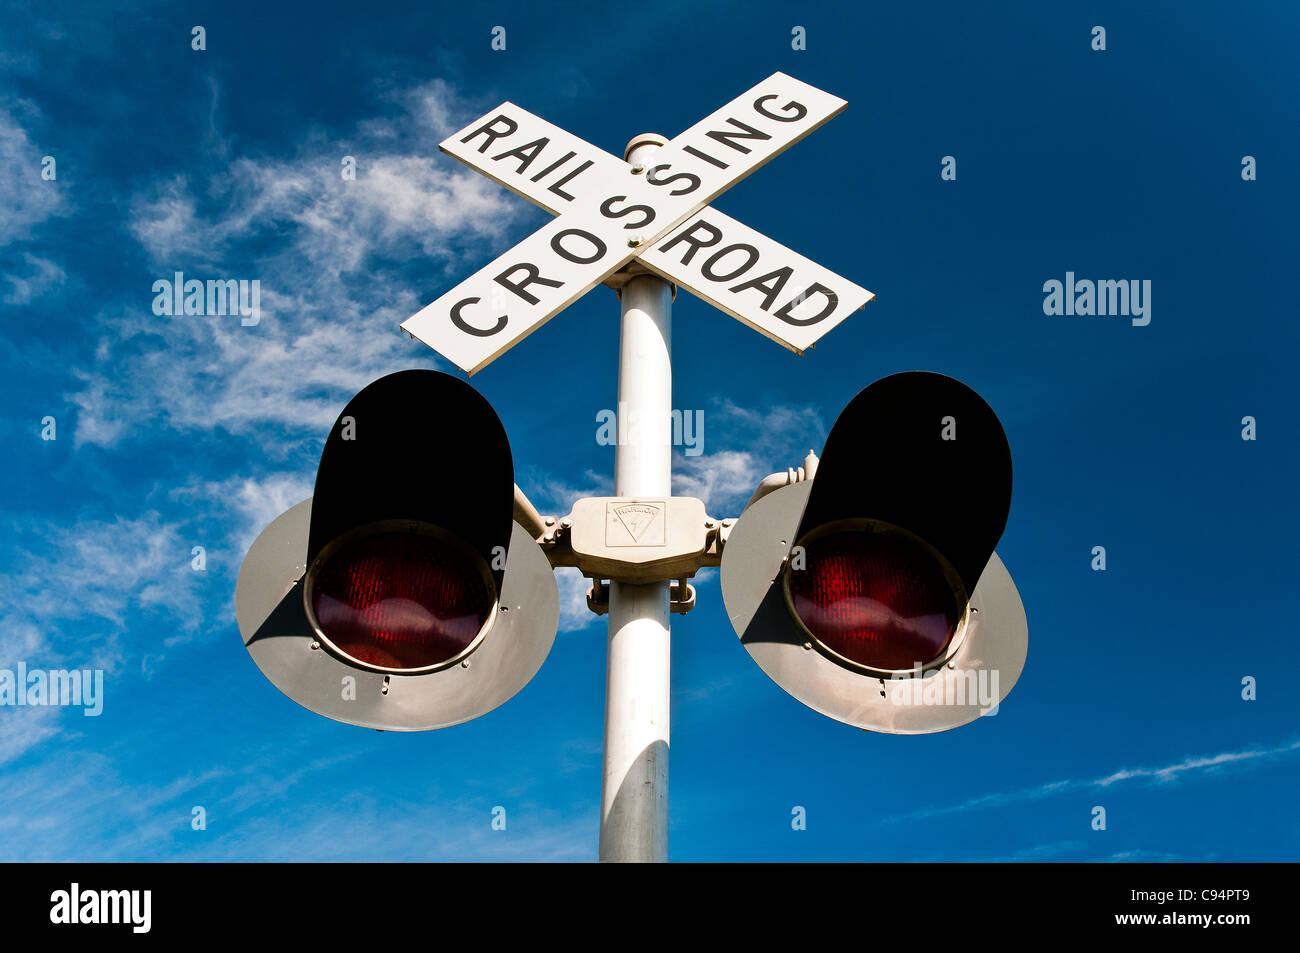 American railroad crossing, Seattle, Washington, USA - Stock Image